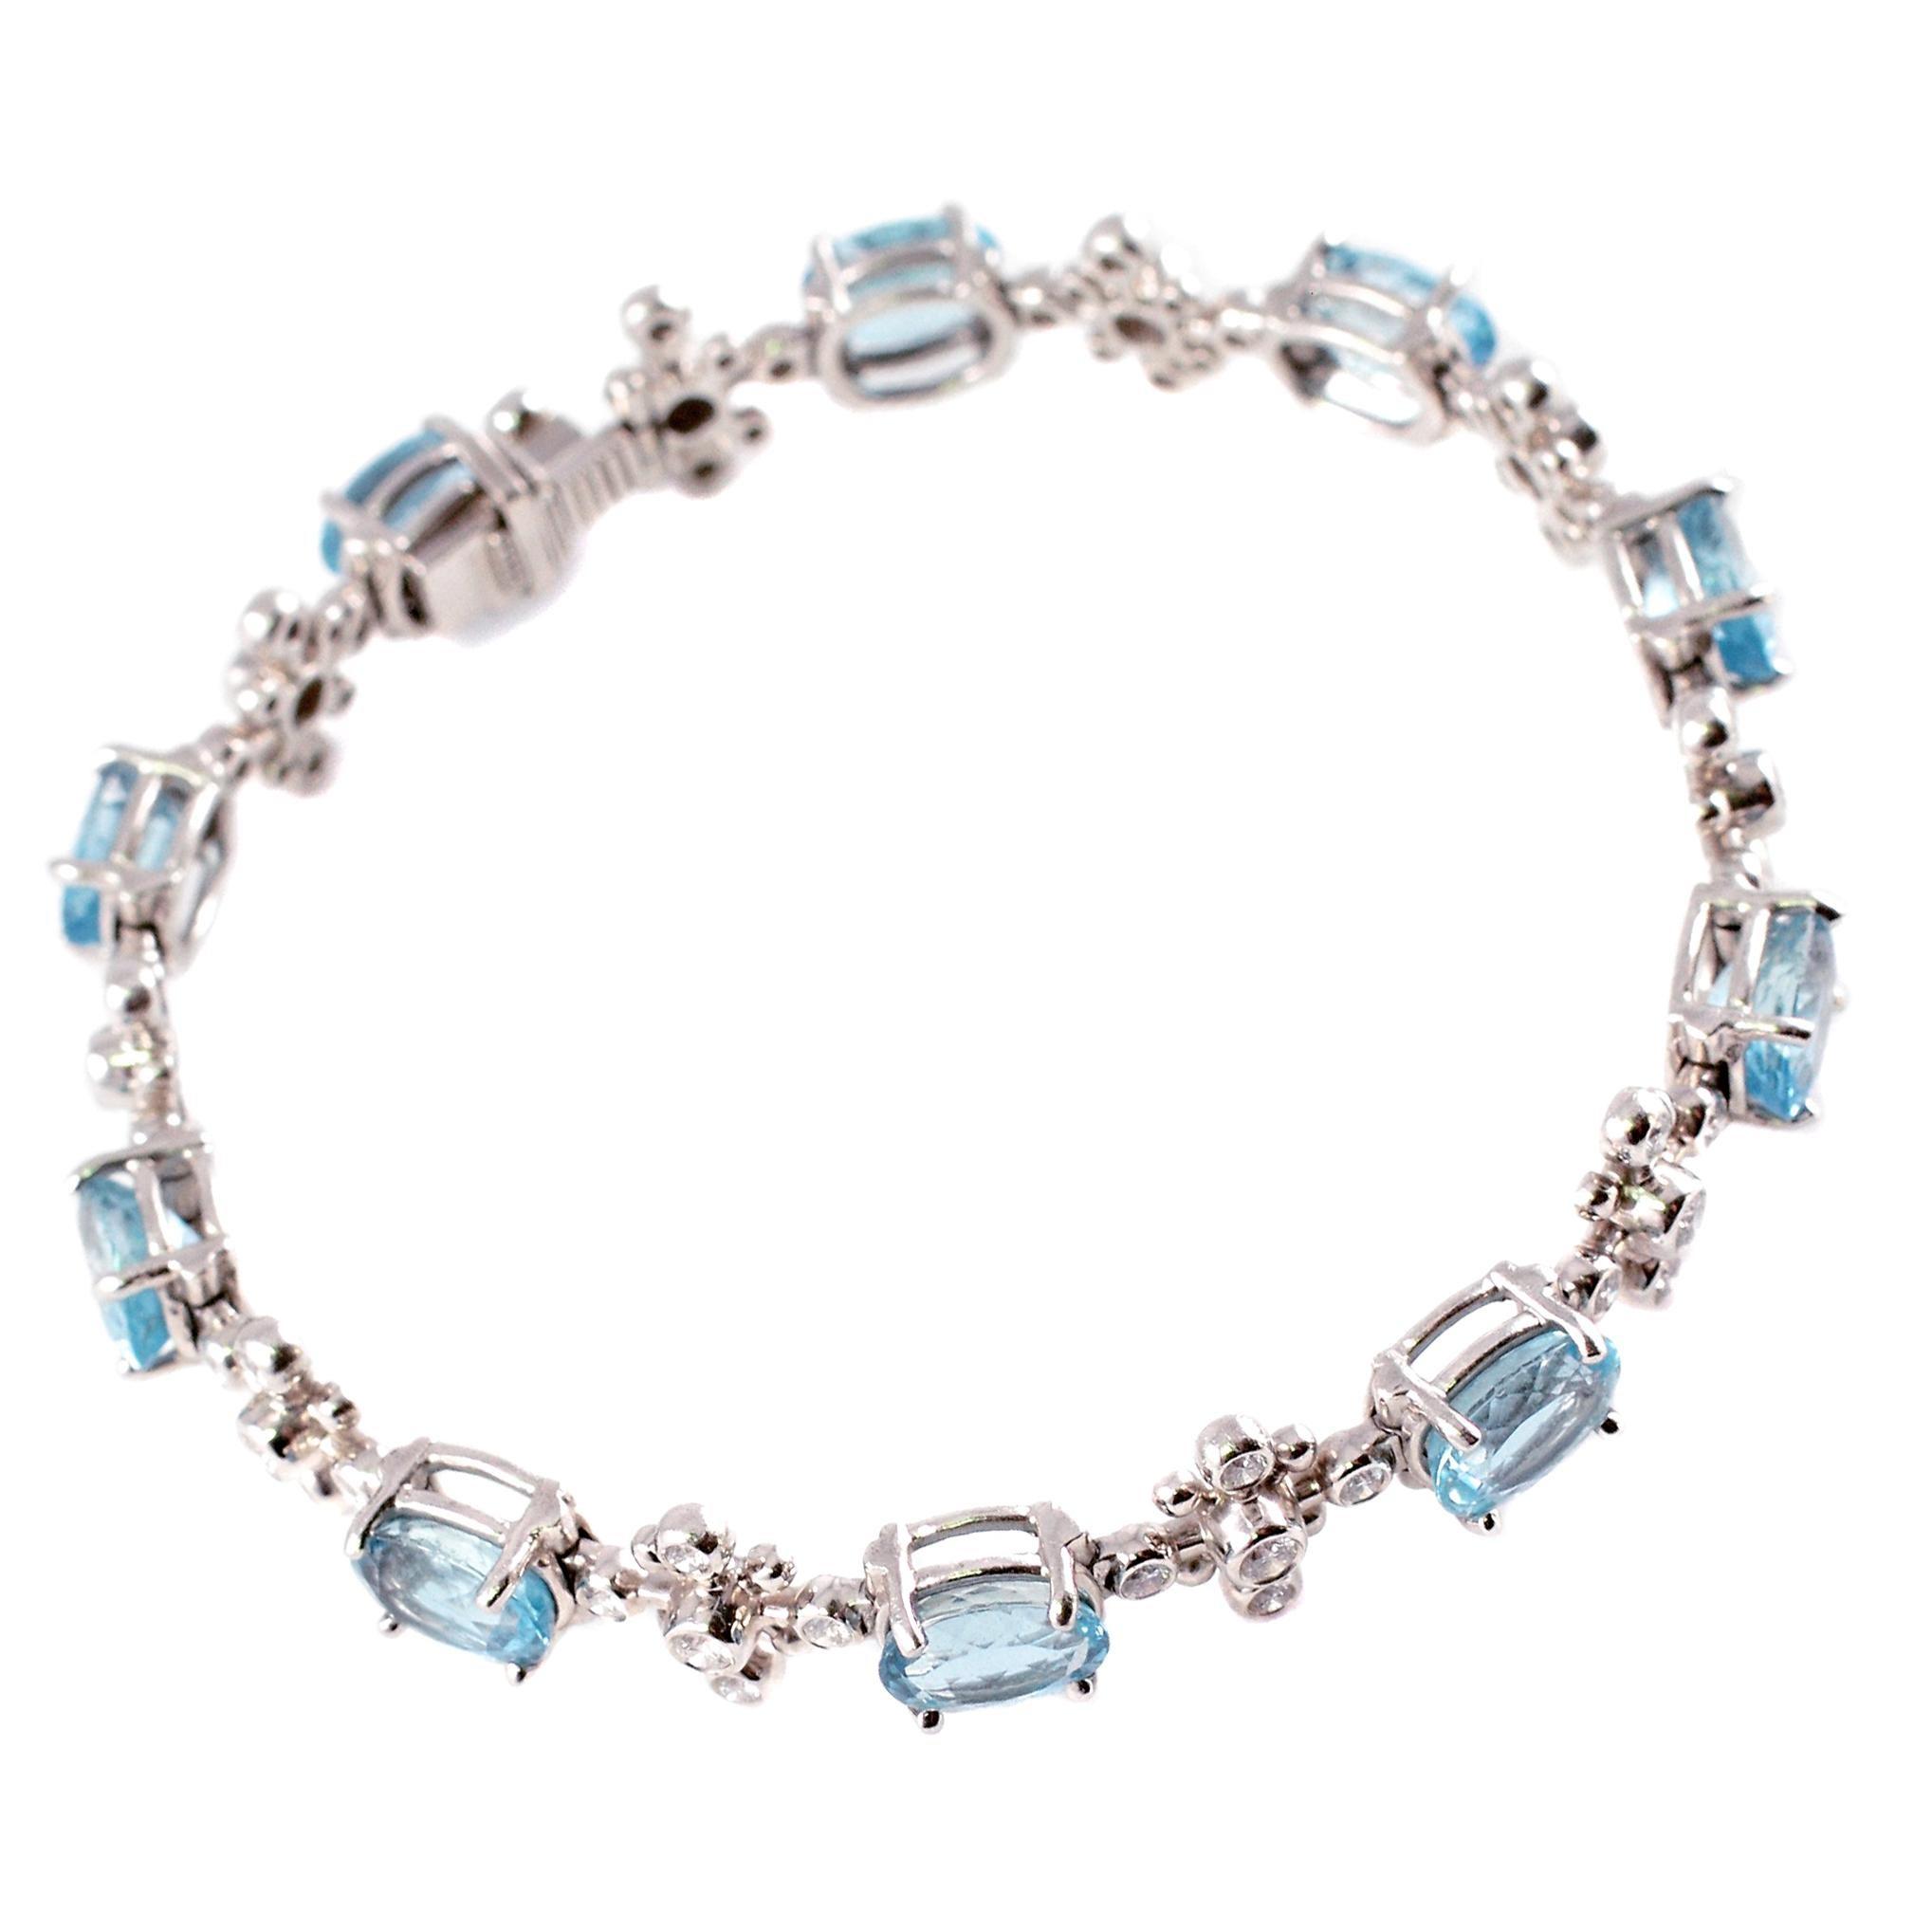 1327371d1f02f Tiffany & Co. Aquamarine Diamond Bracelet from the